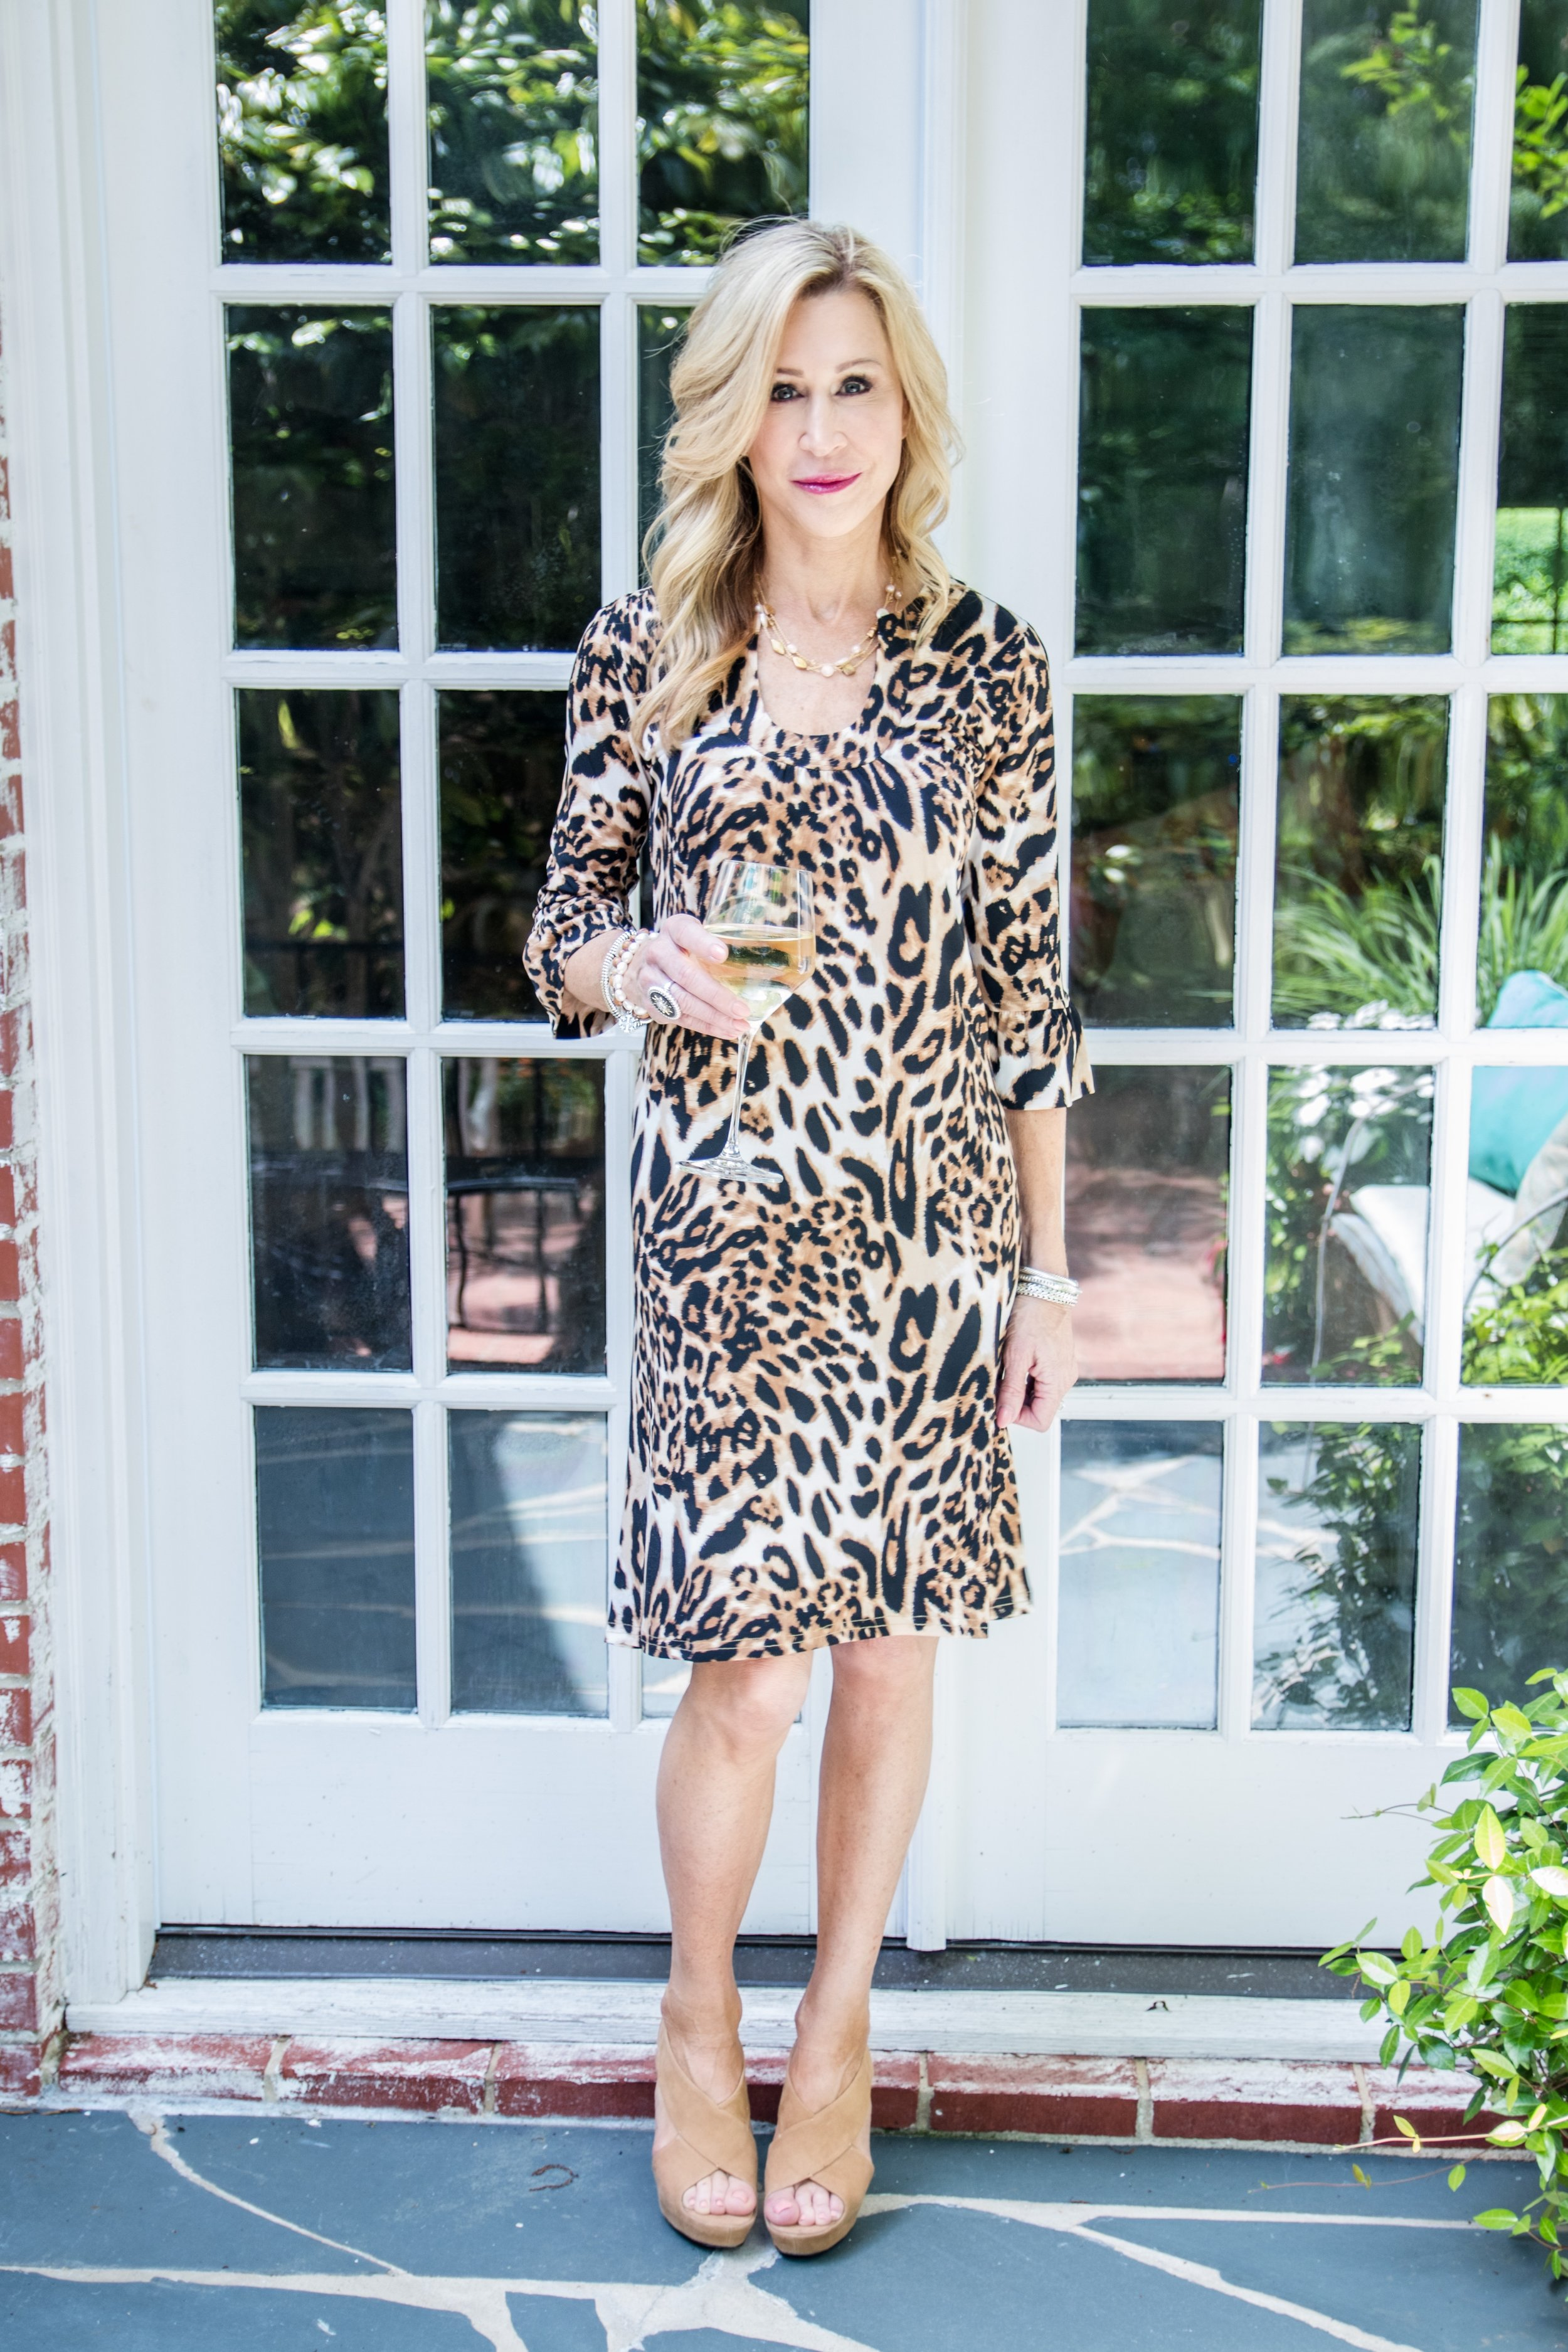 Julie Miles Leopard Dress - Crazy Blonde Style